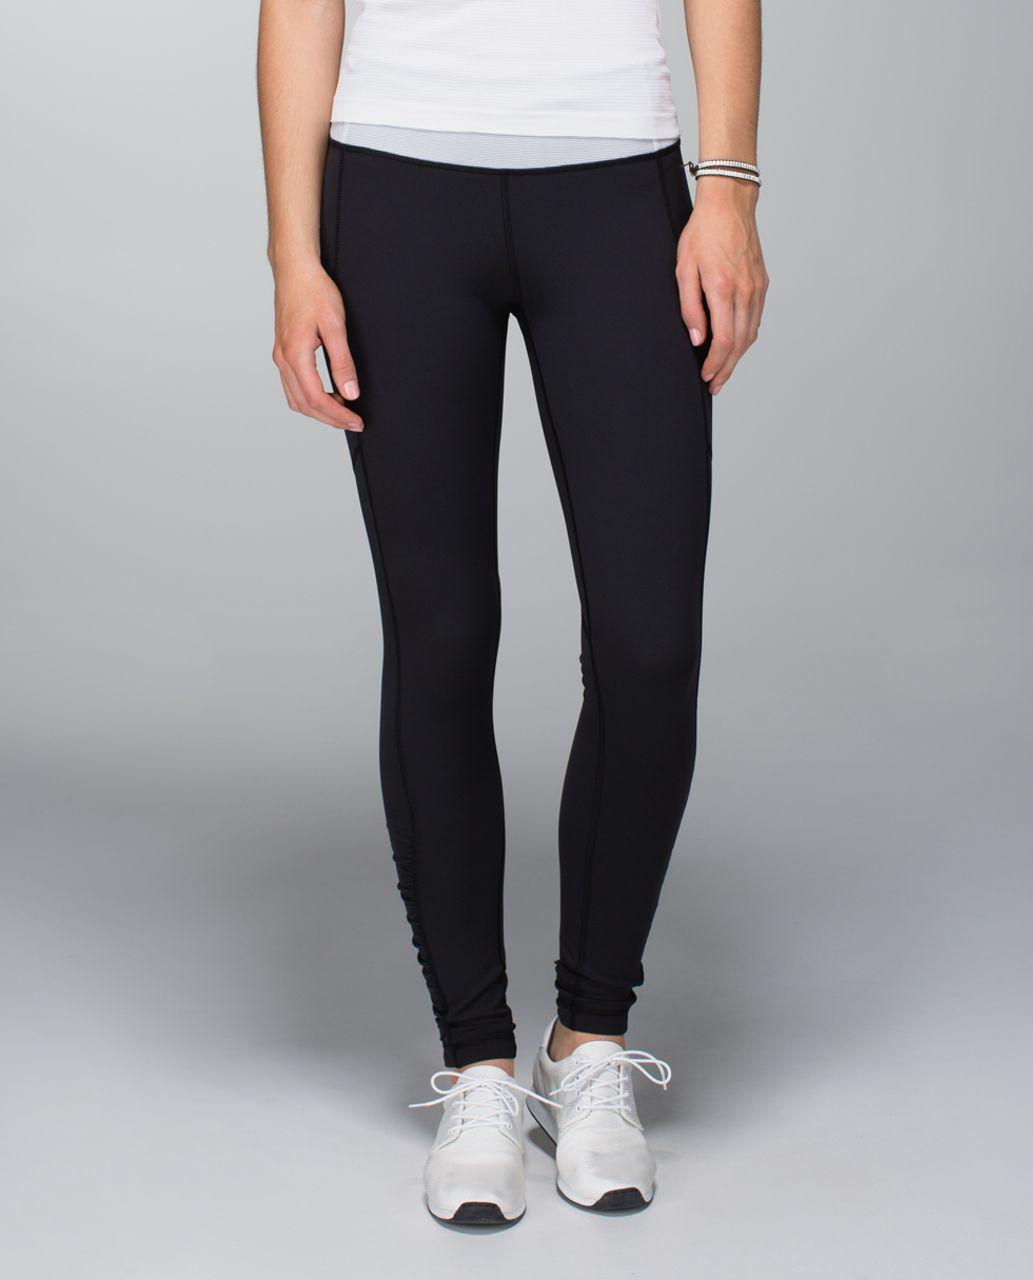 Lululemon Speed Tight *Brushed Interlock - Black / Wee Stripe White Ambient Grey